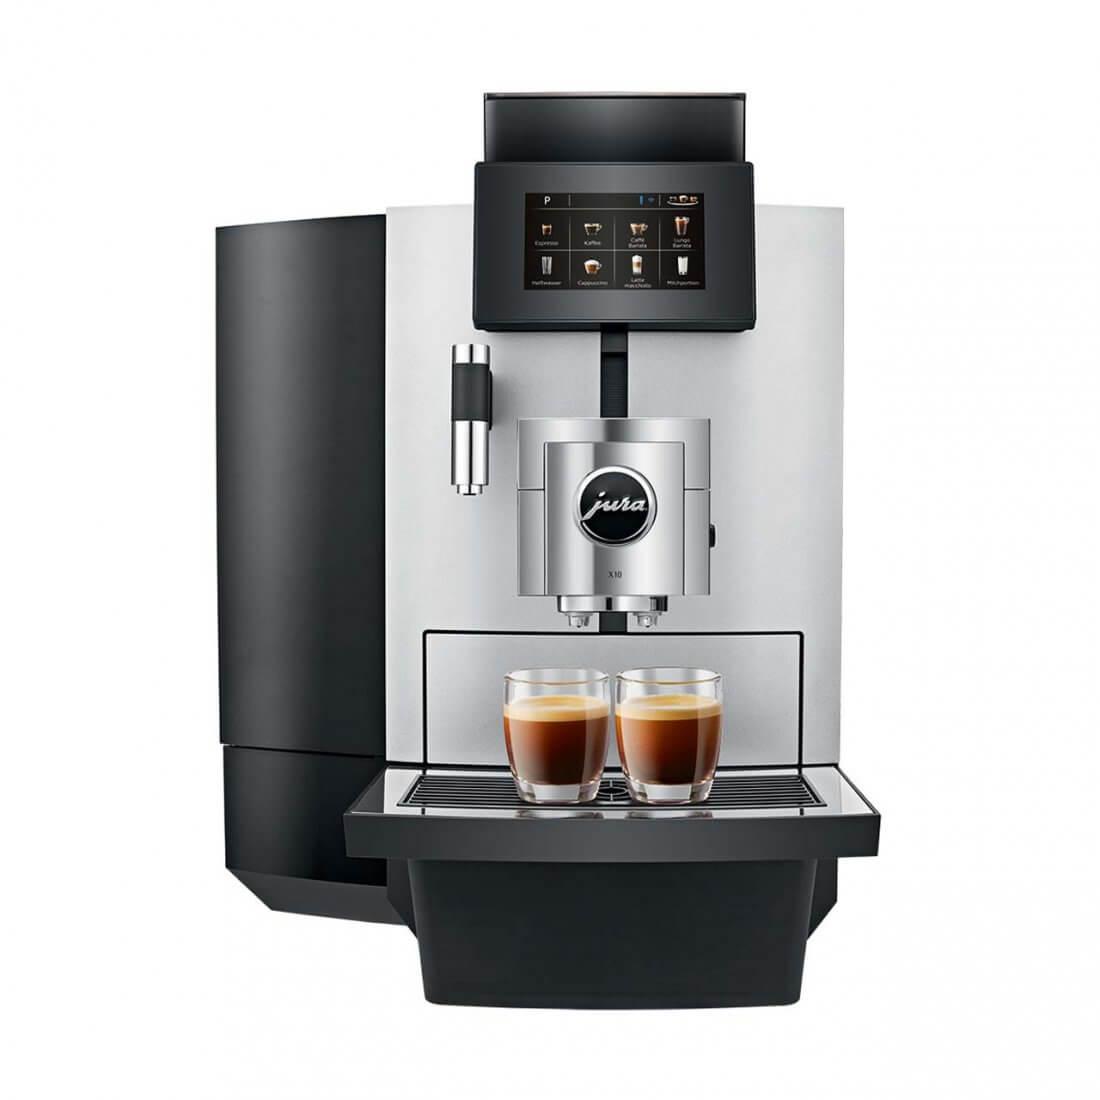 JURA X10: Der Kaffeespezialitäten-Profi - modern, robust, komfortabel, vielseitig!